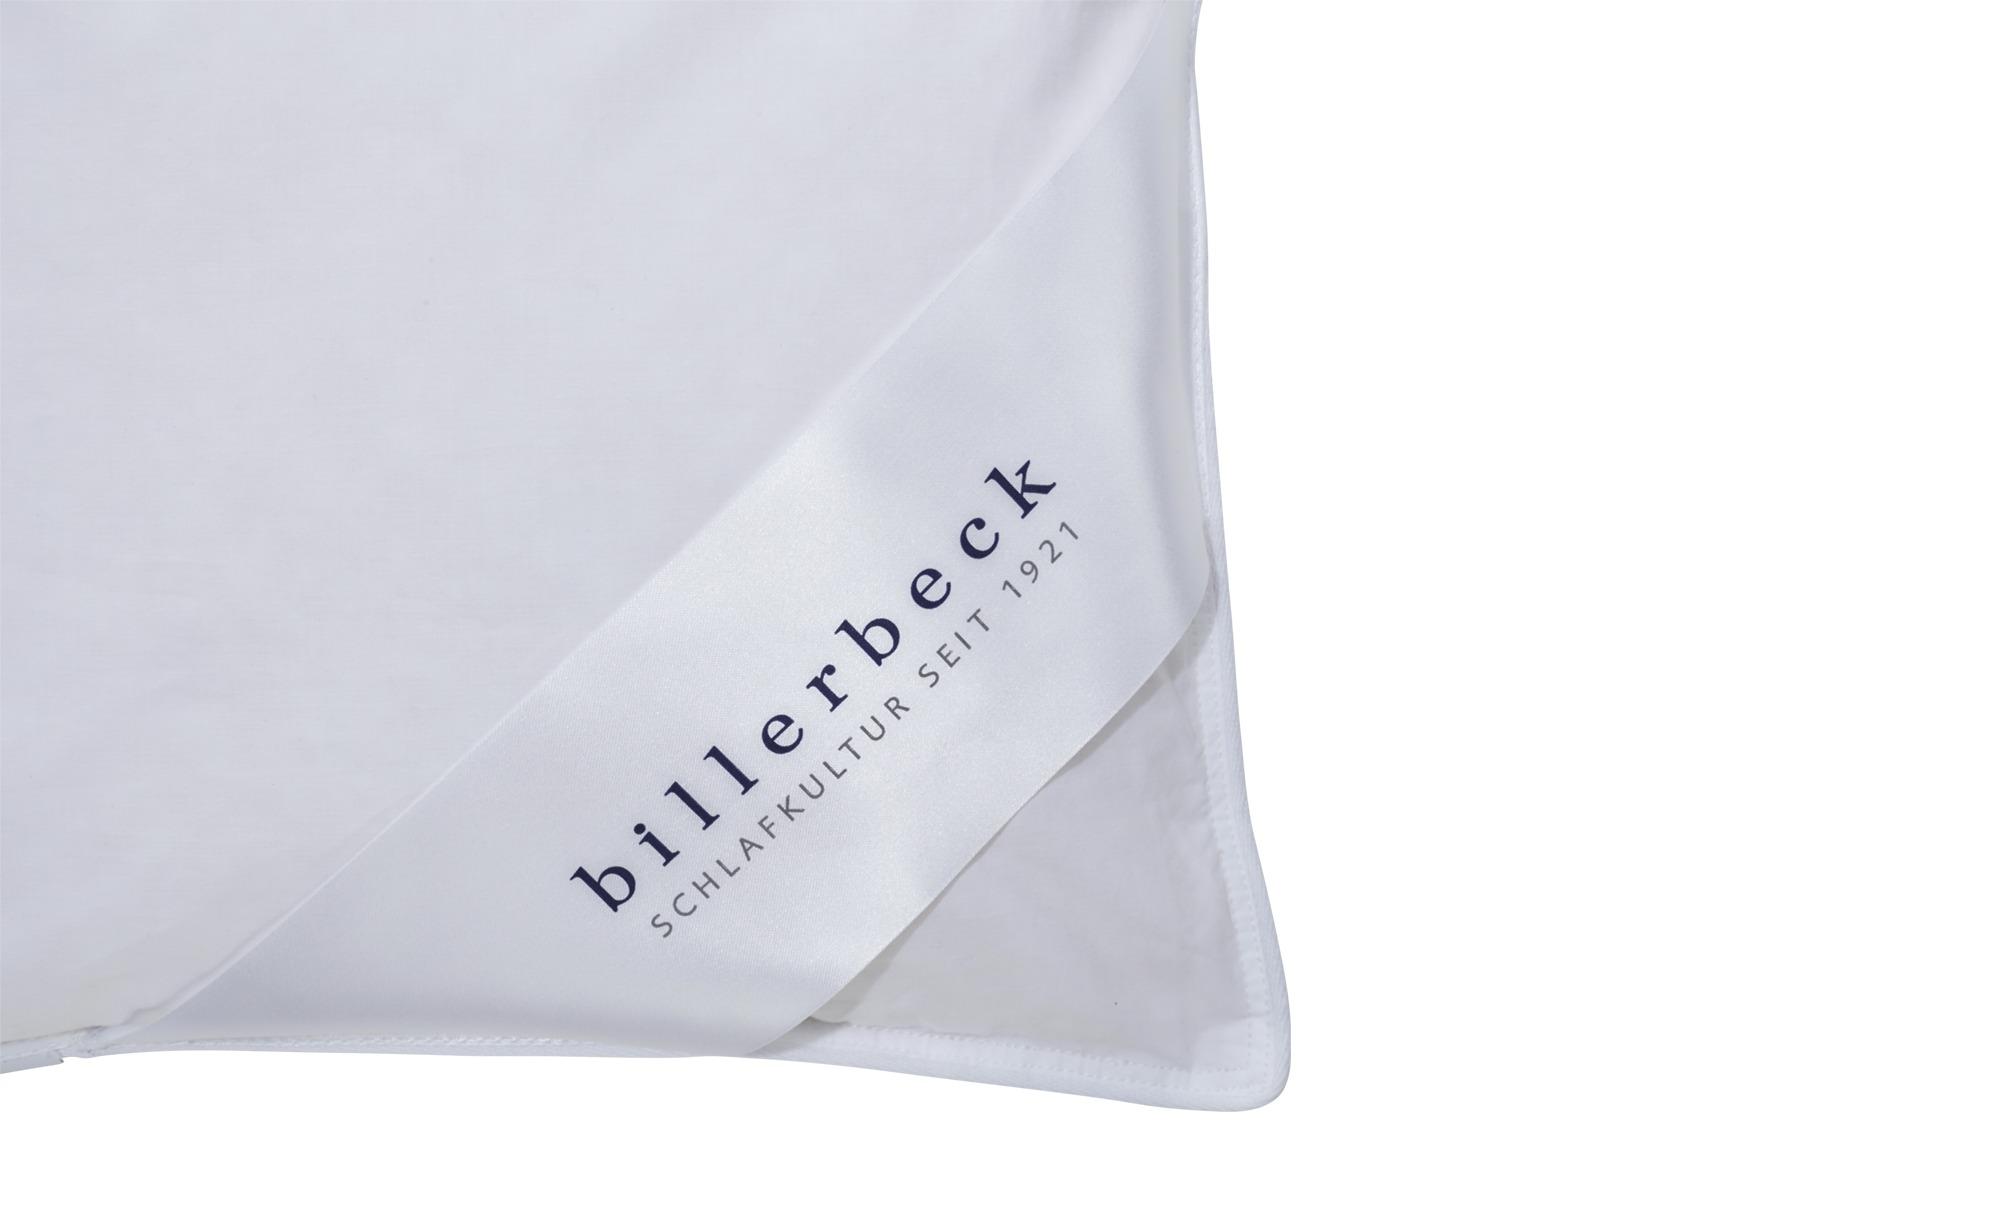 Billerbeck Kassettendecke II  Ramona ¦ weiß ¦ Maße (cm): B: 155 Bettwaren > Bettdecken > Bettdecken in Übergrößen - Höffner